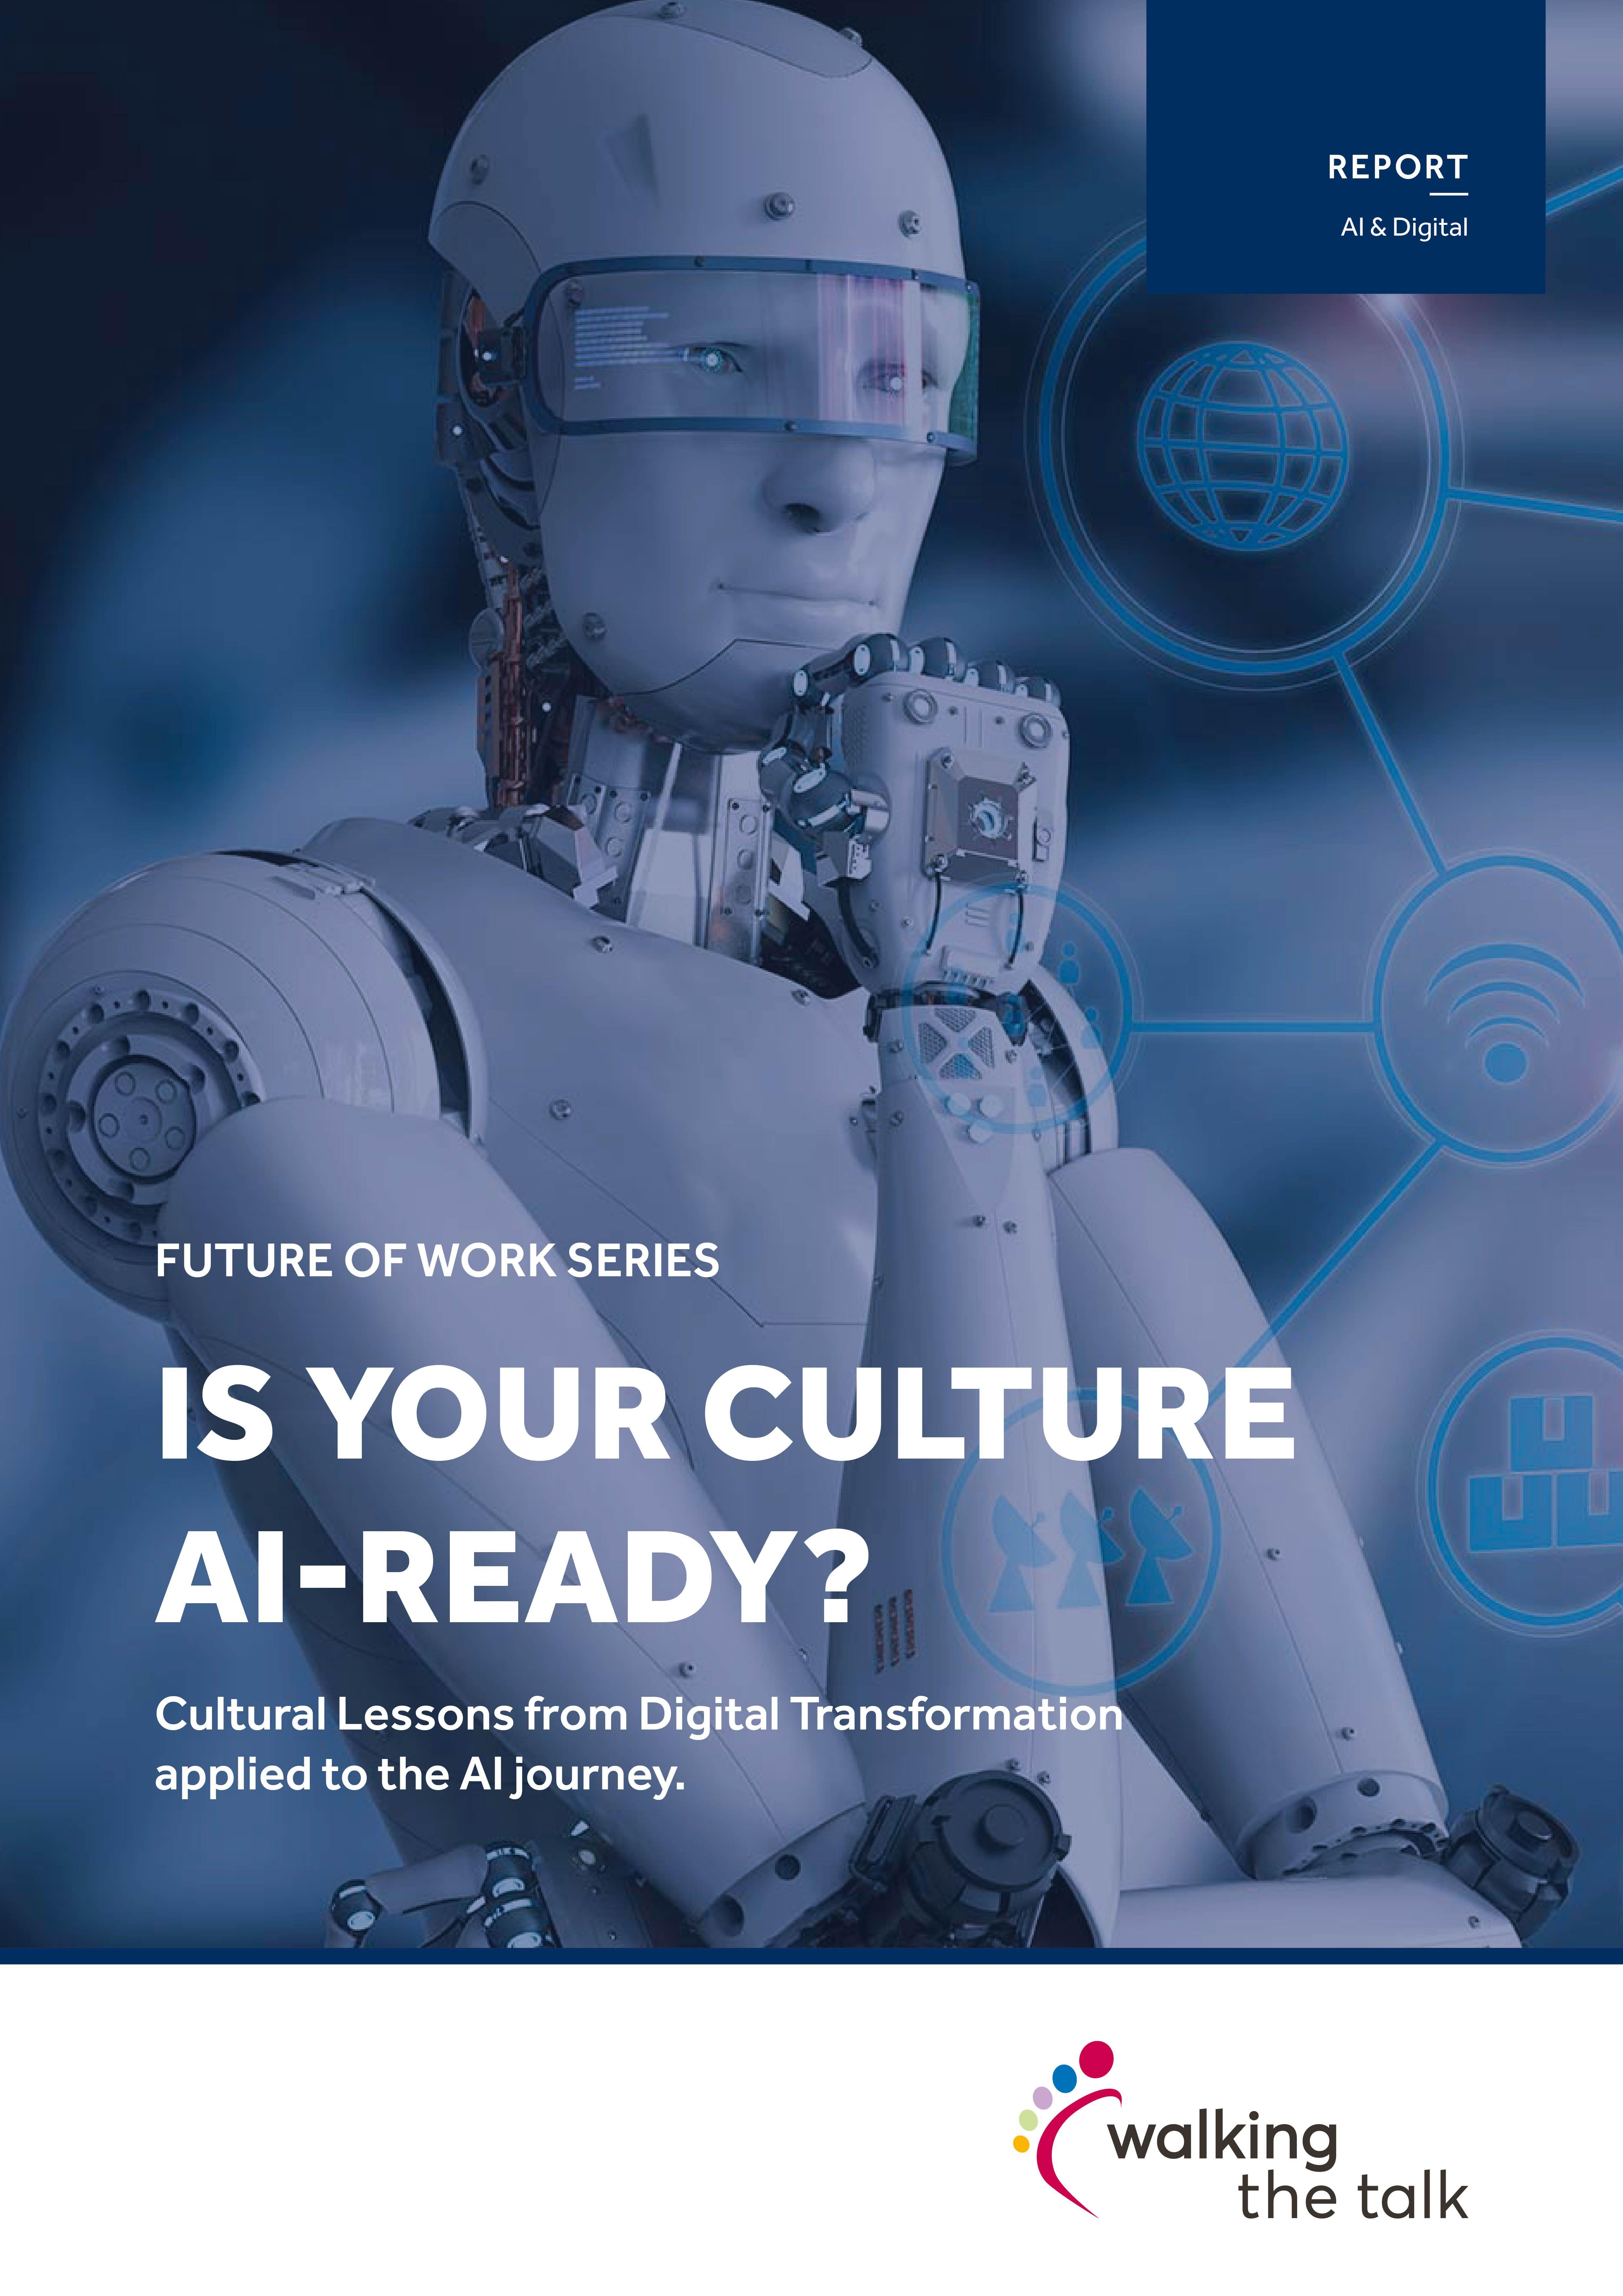 AI and Digital cover